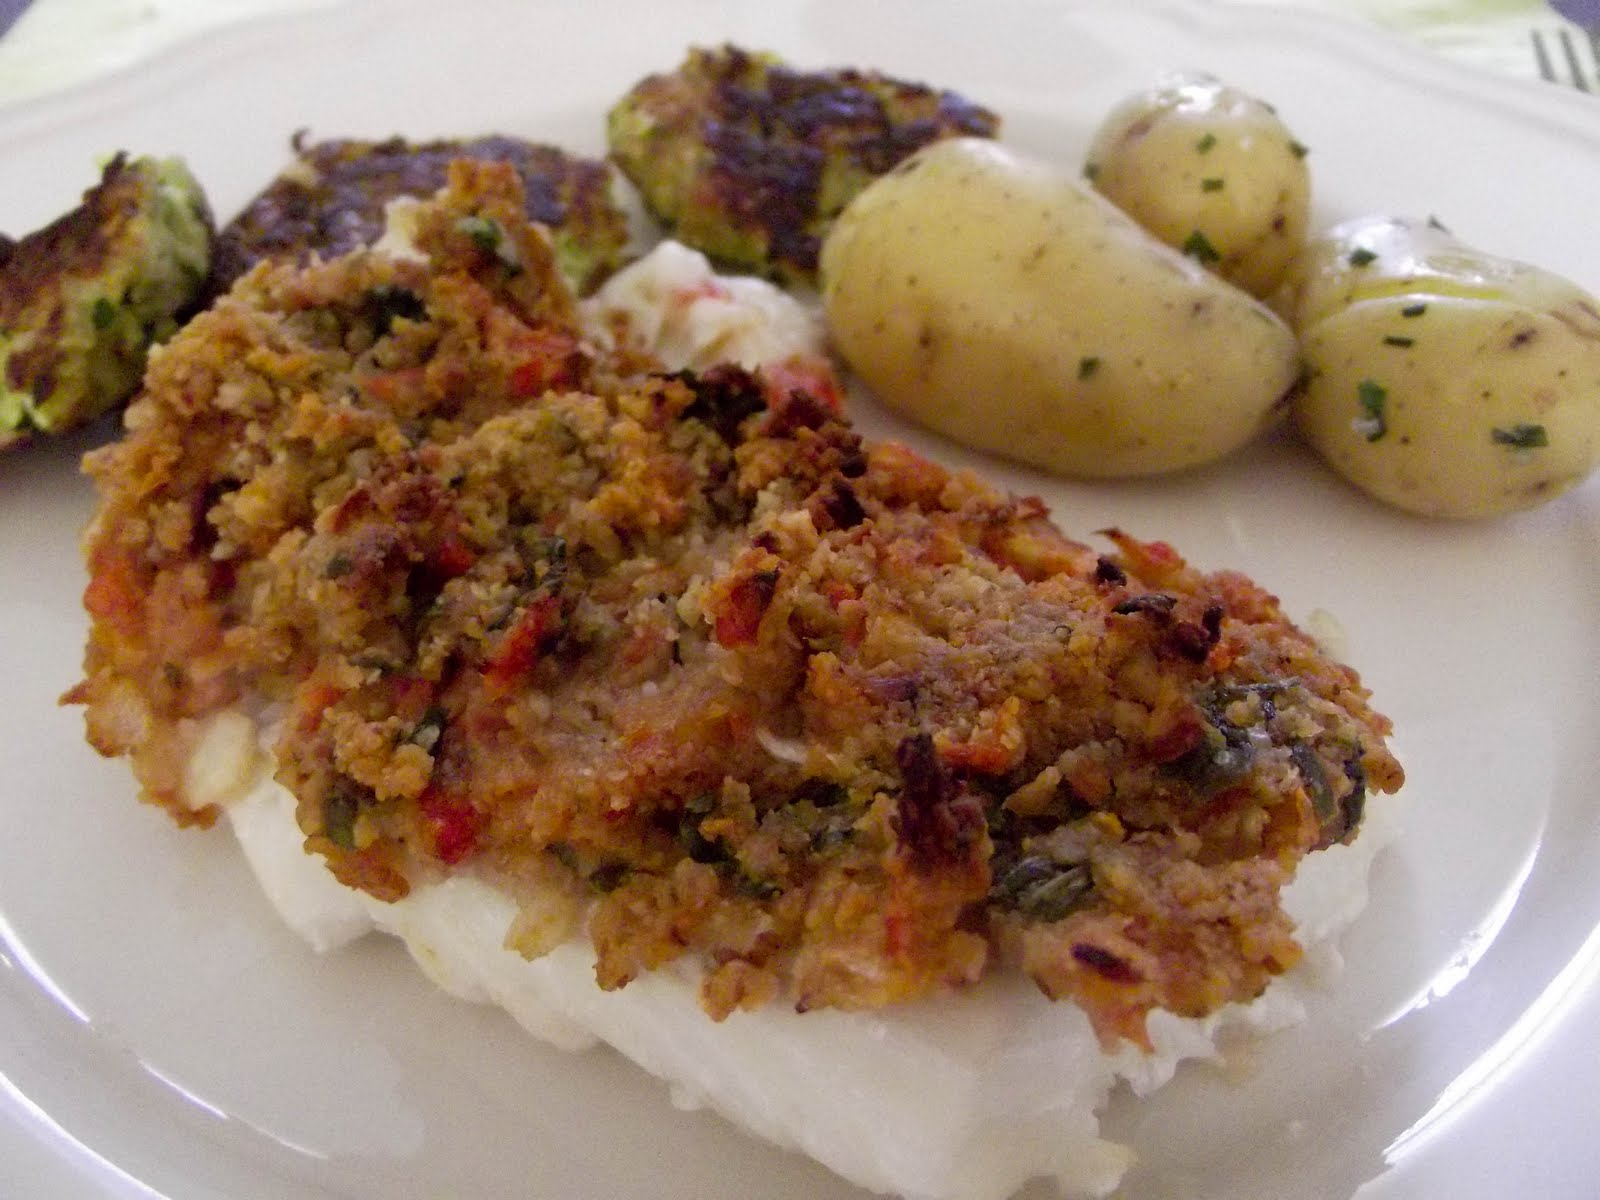 Dos De Cabillaud En Croute De Basilic Et Noix De Pecan